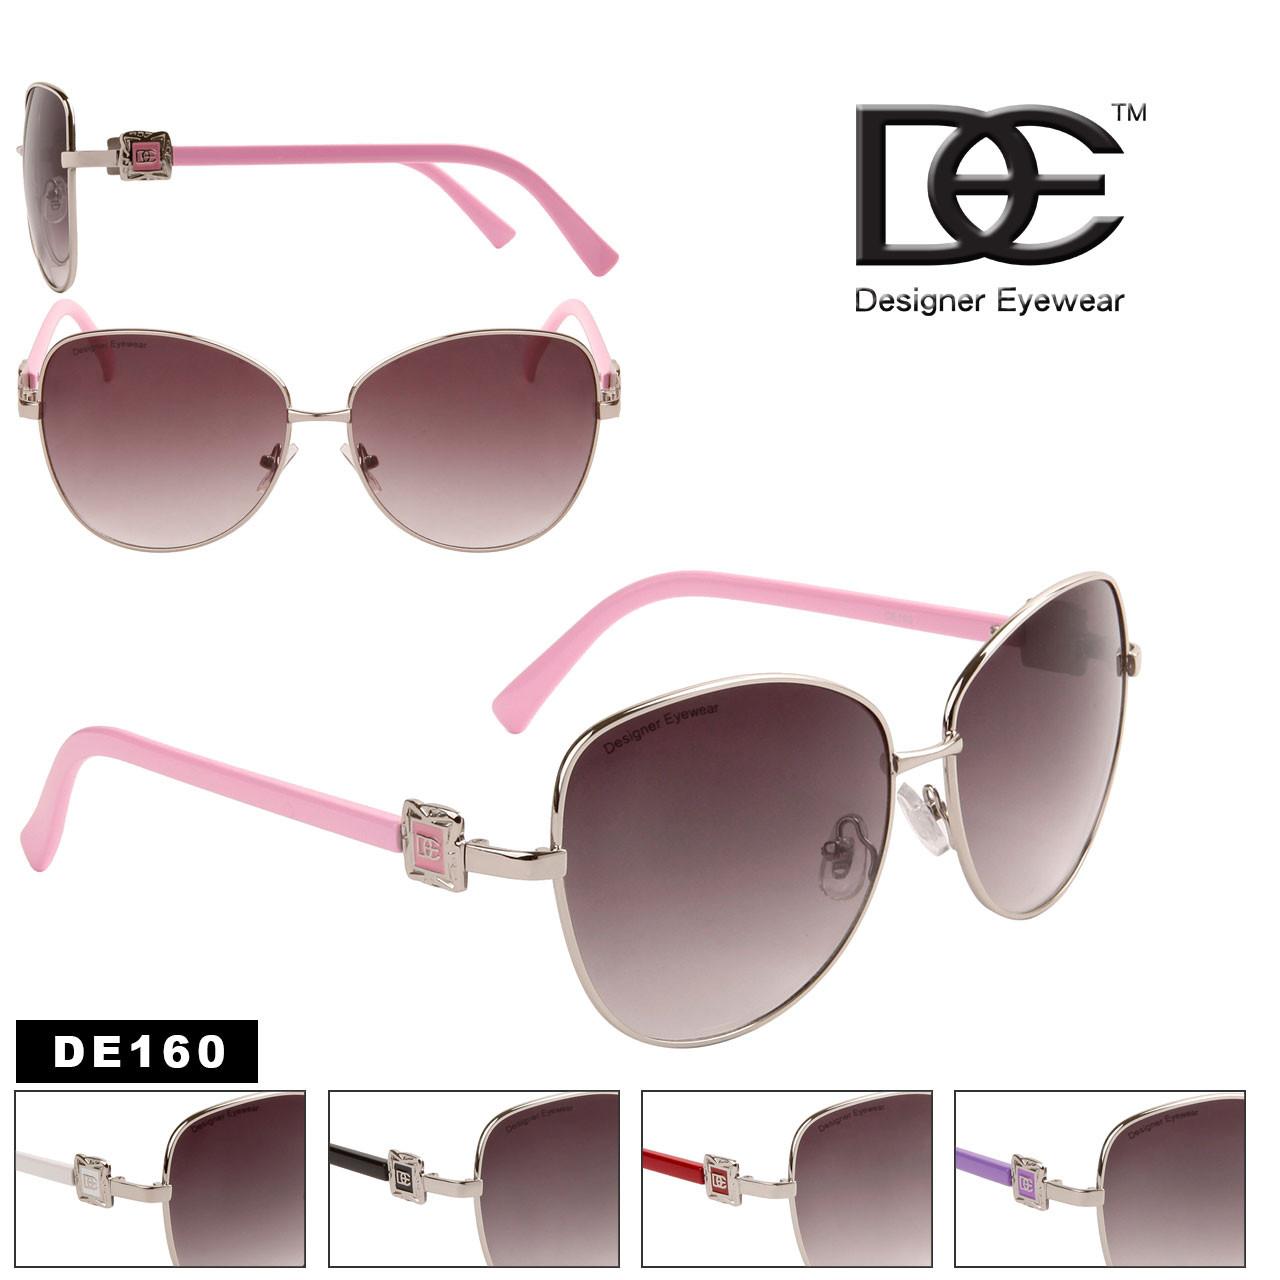 DE™ Designer Sunglasses Wholesale - Style #DE160